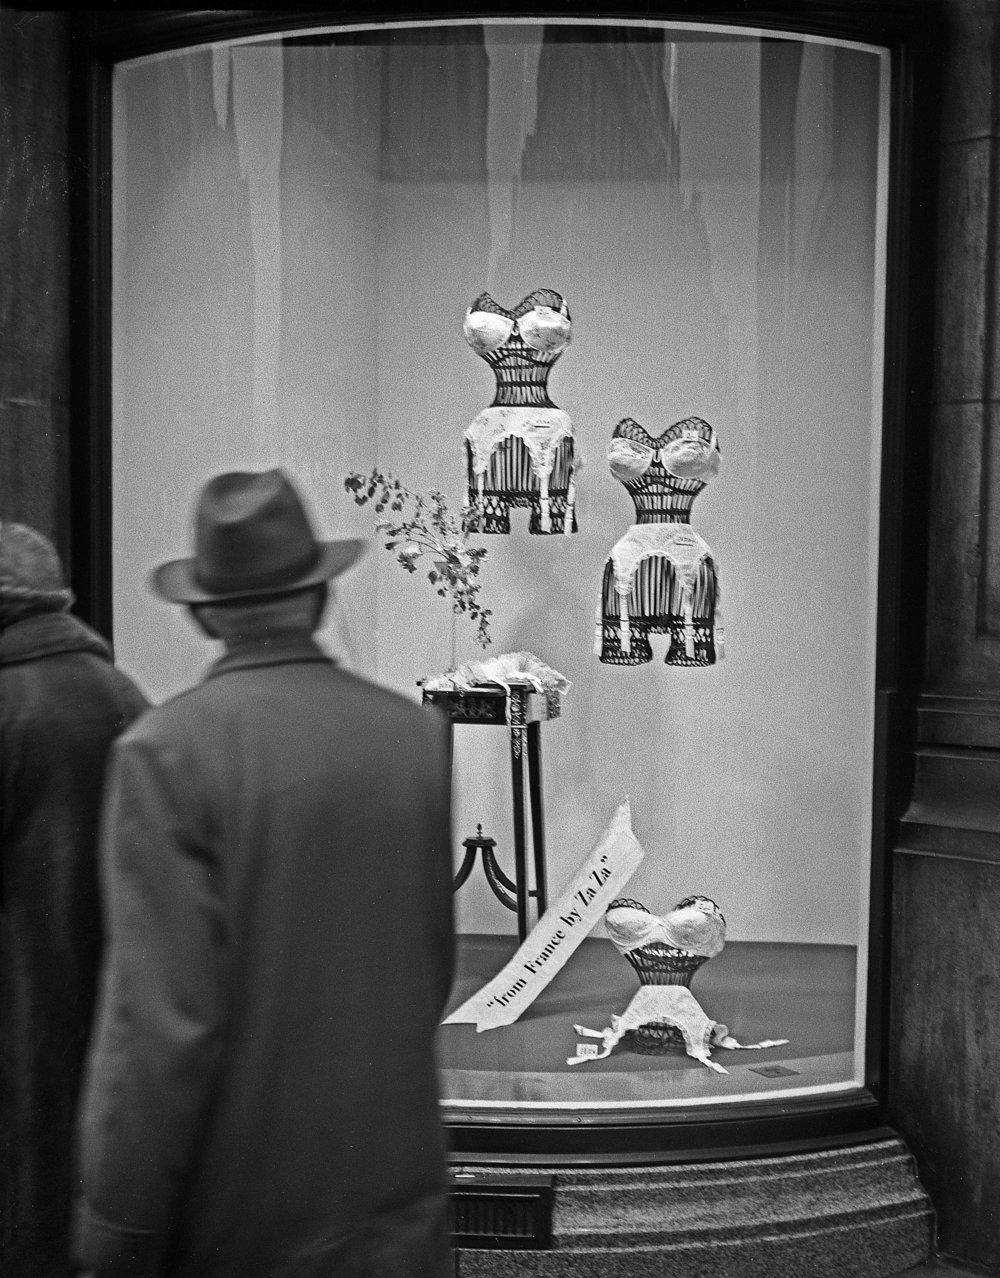 London, c. 1960